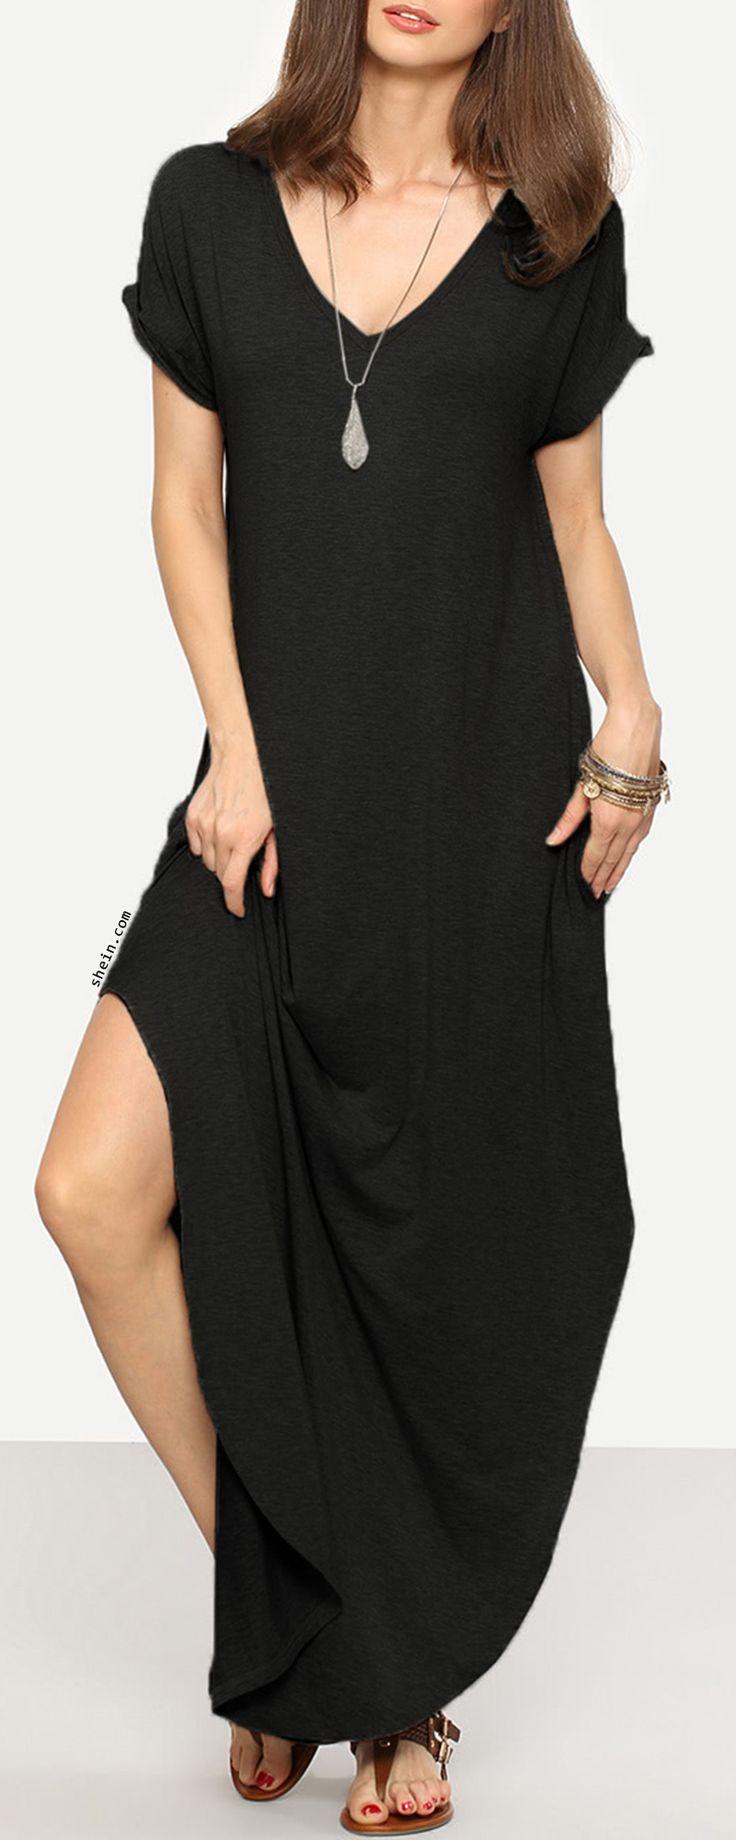 Rolled-Cuff Pockets Side Split Curved Dress